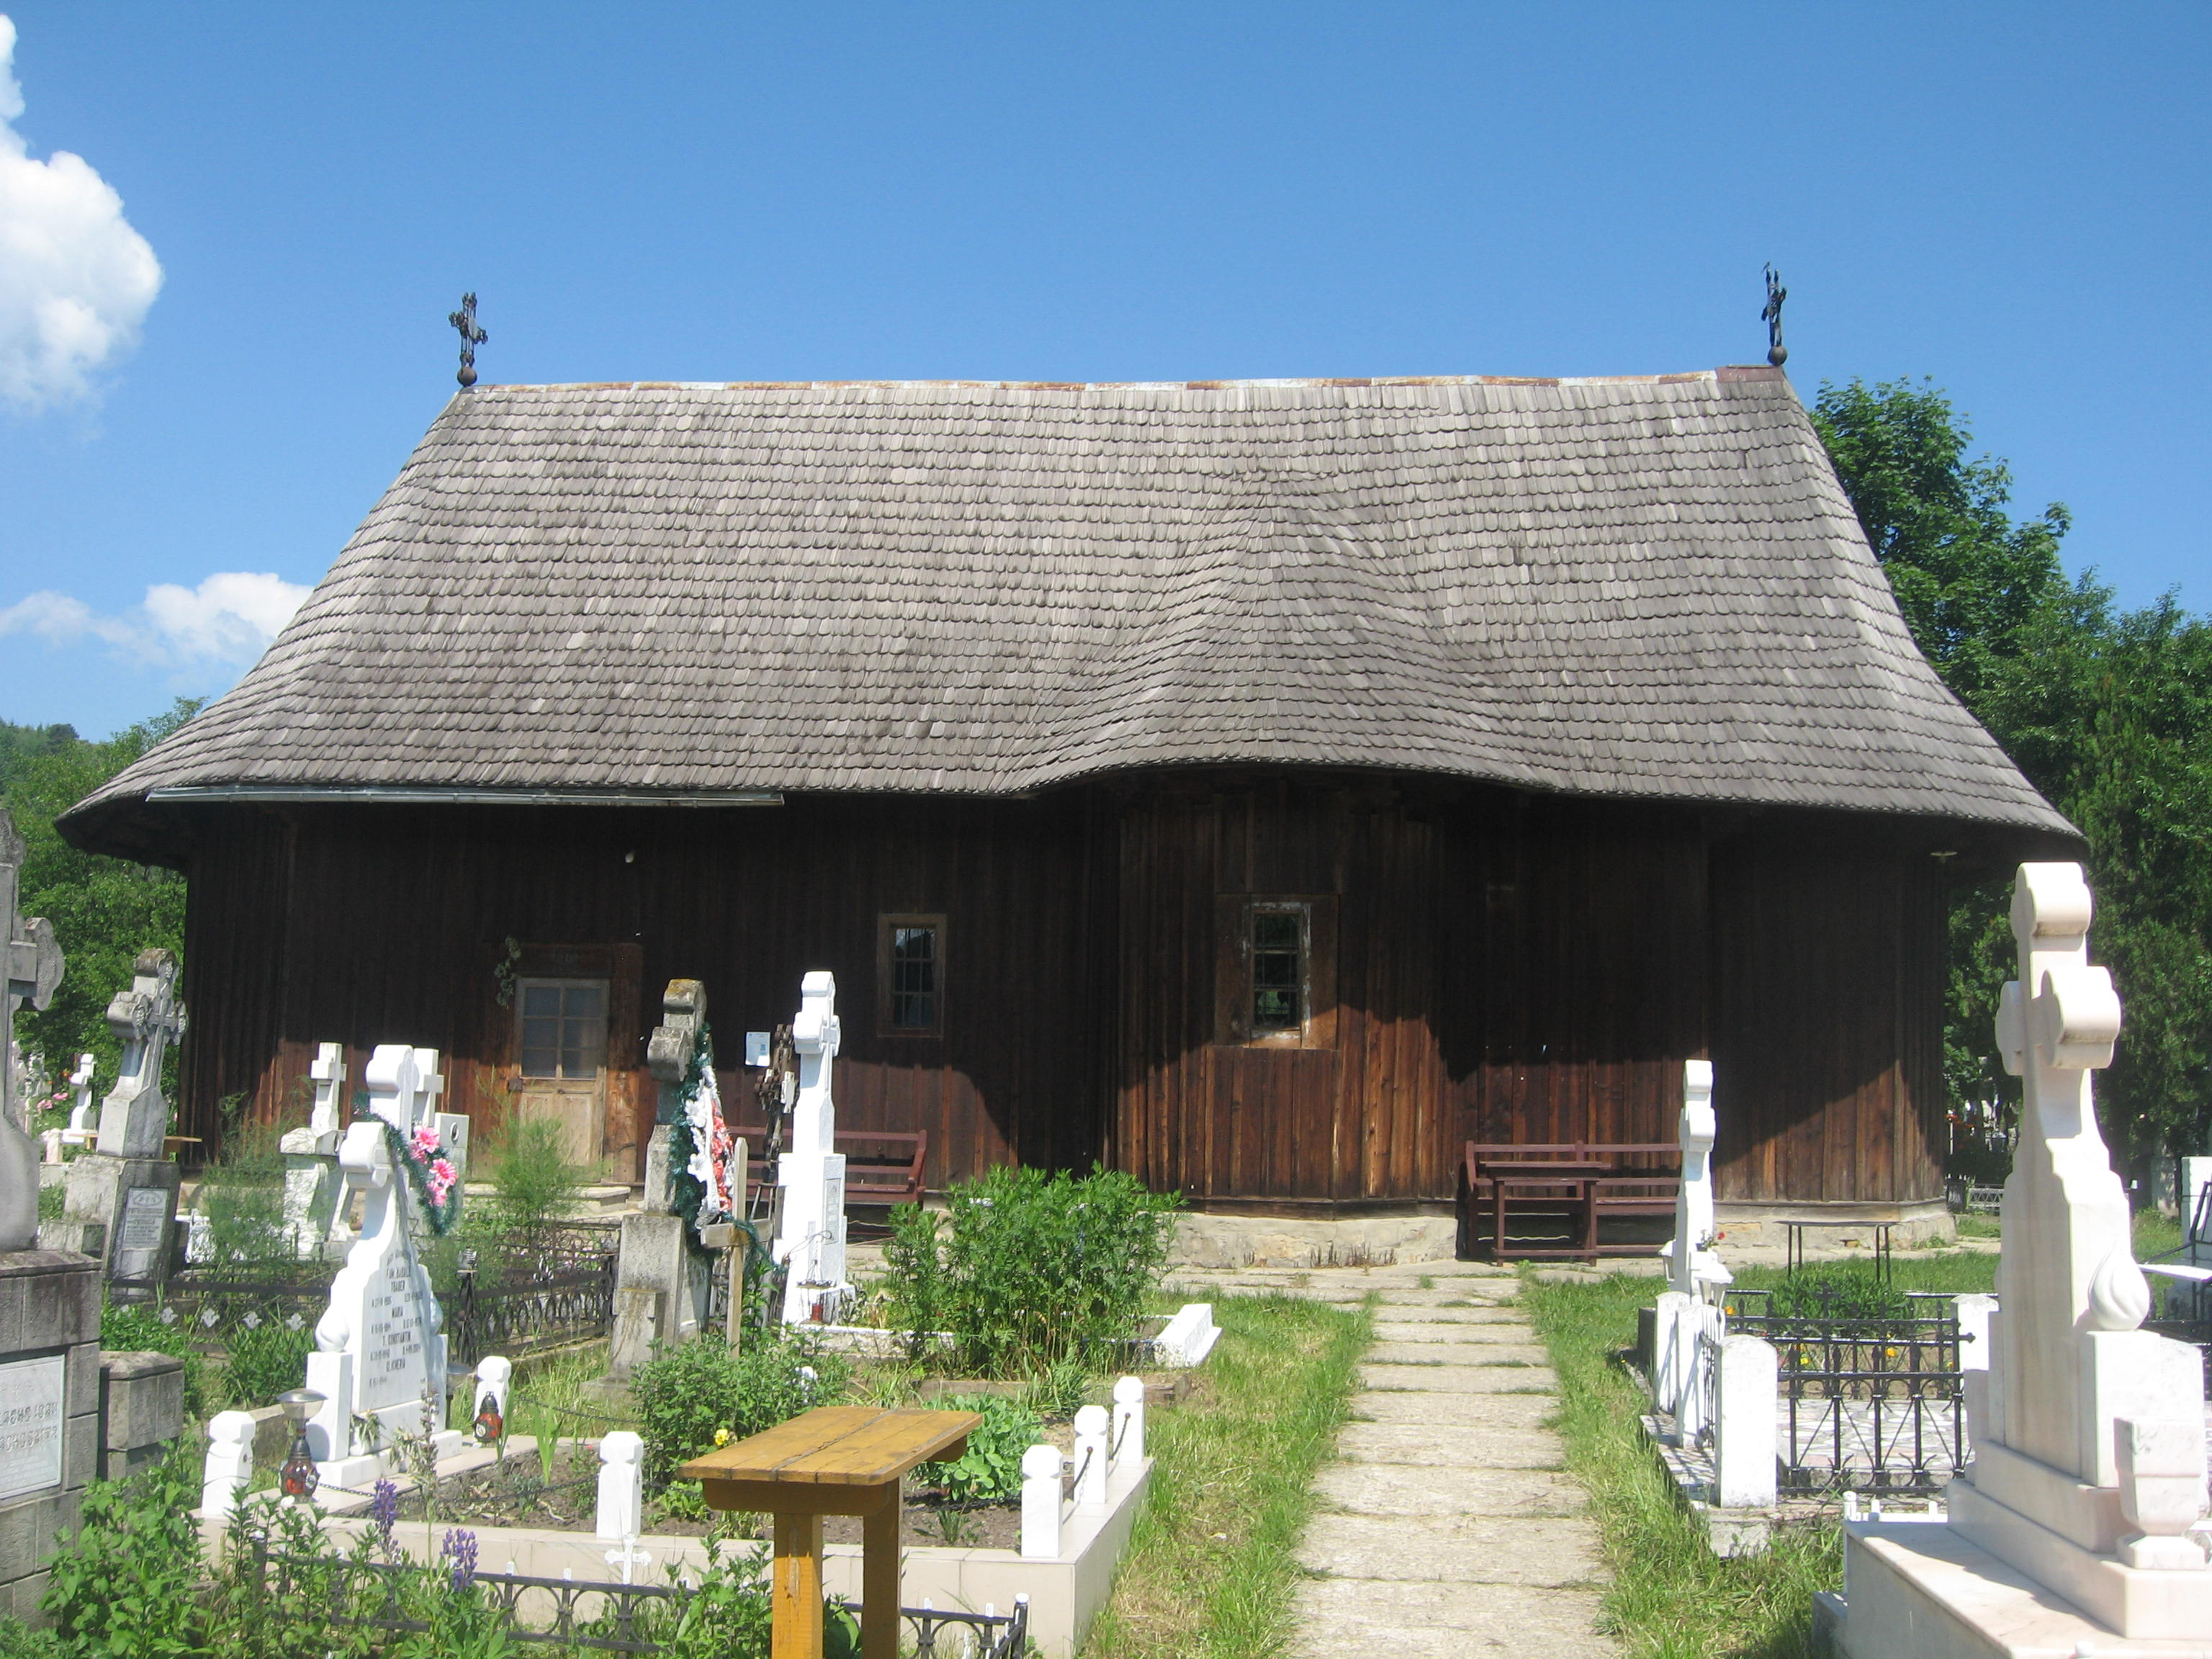 Biserica de lemn Sfântul Nicolae din Vama